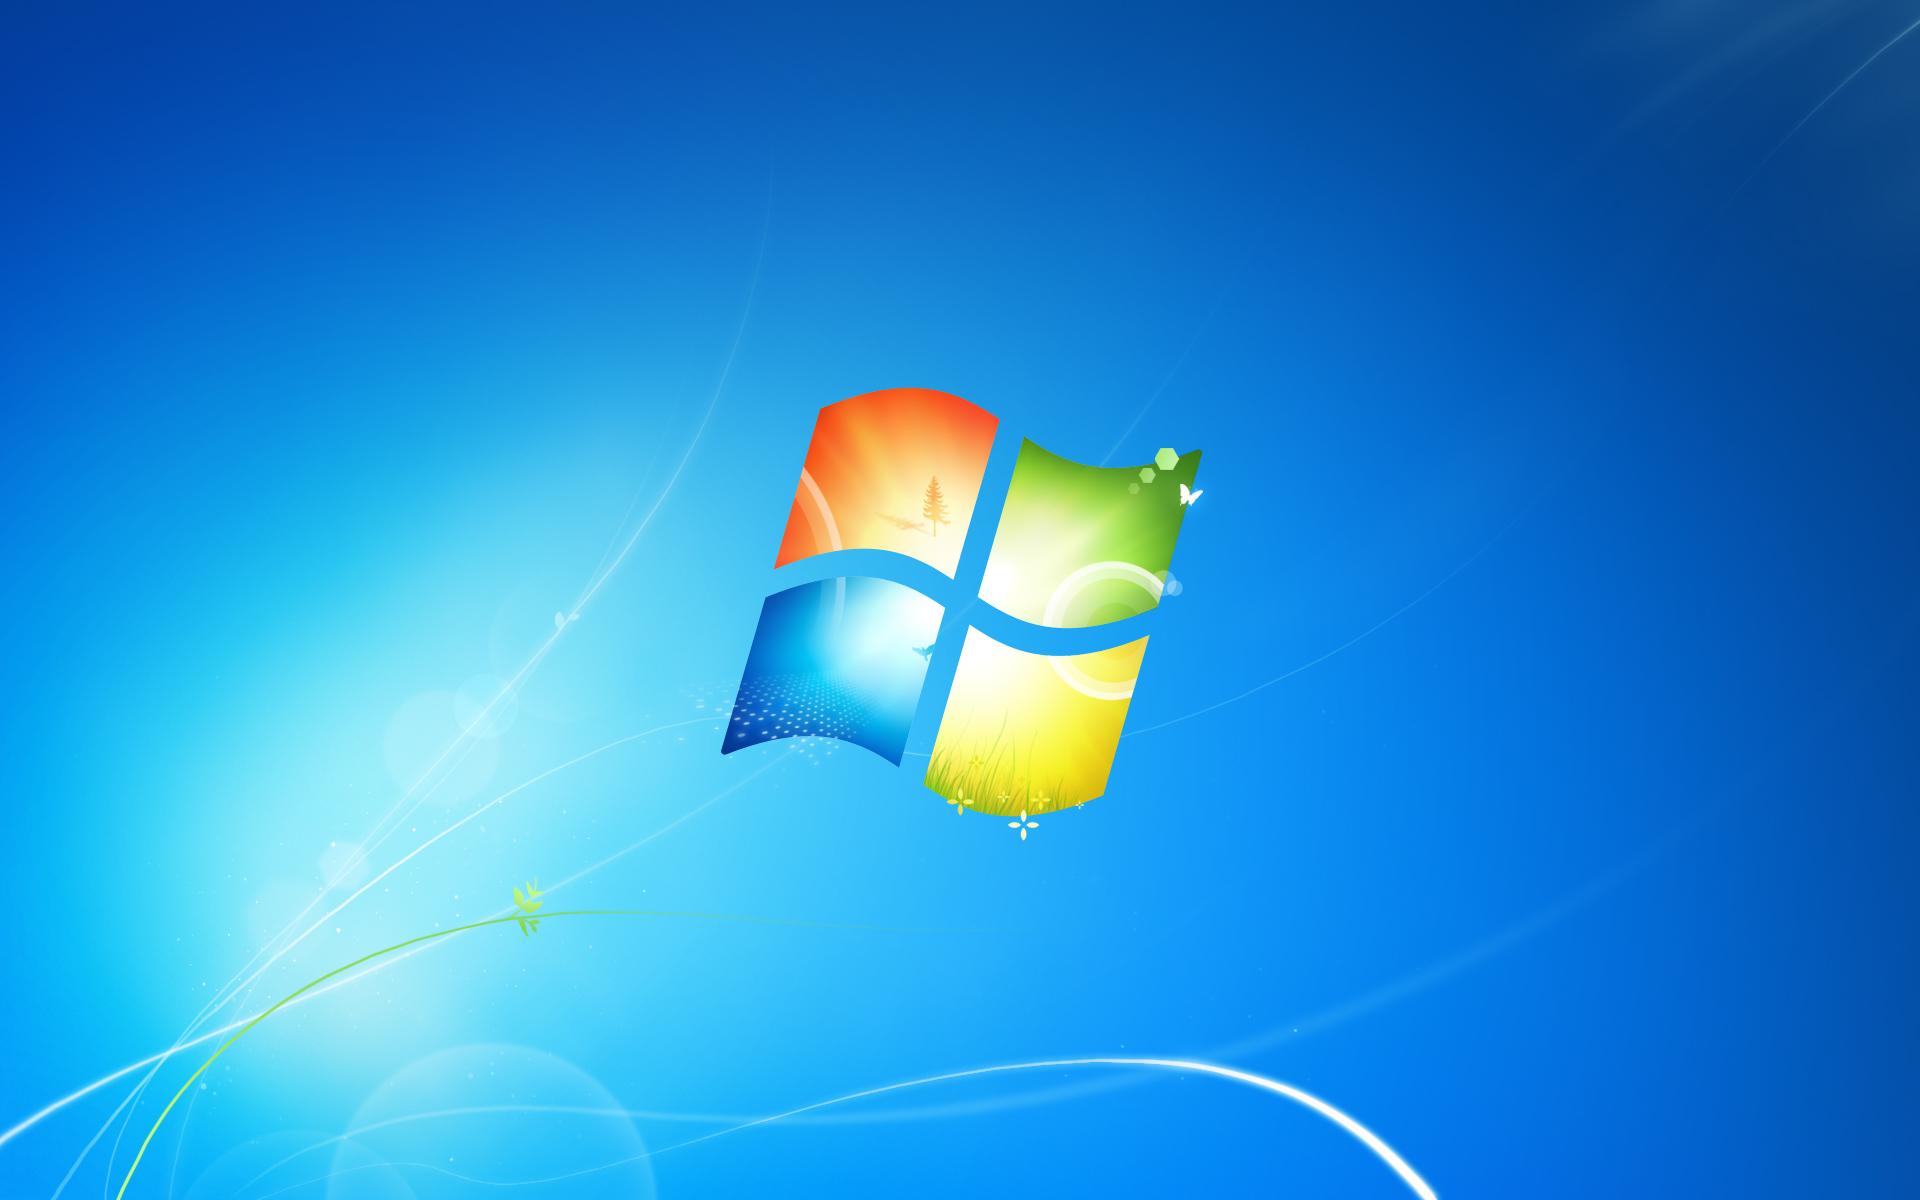 windows 7 rtm wallpaper 117702